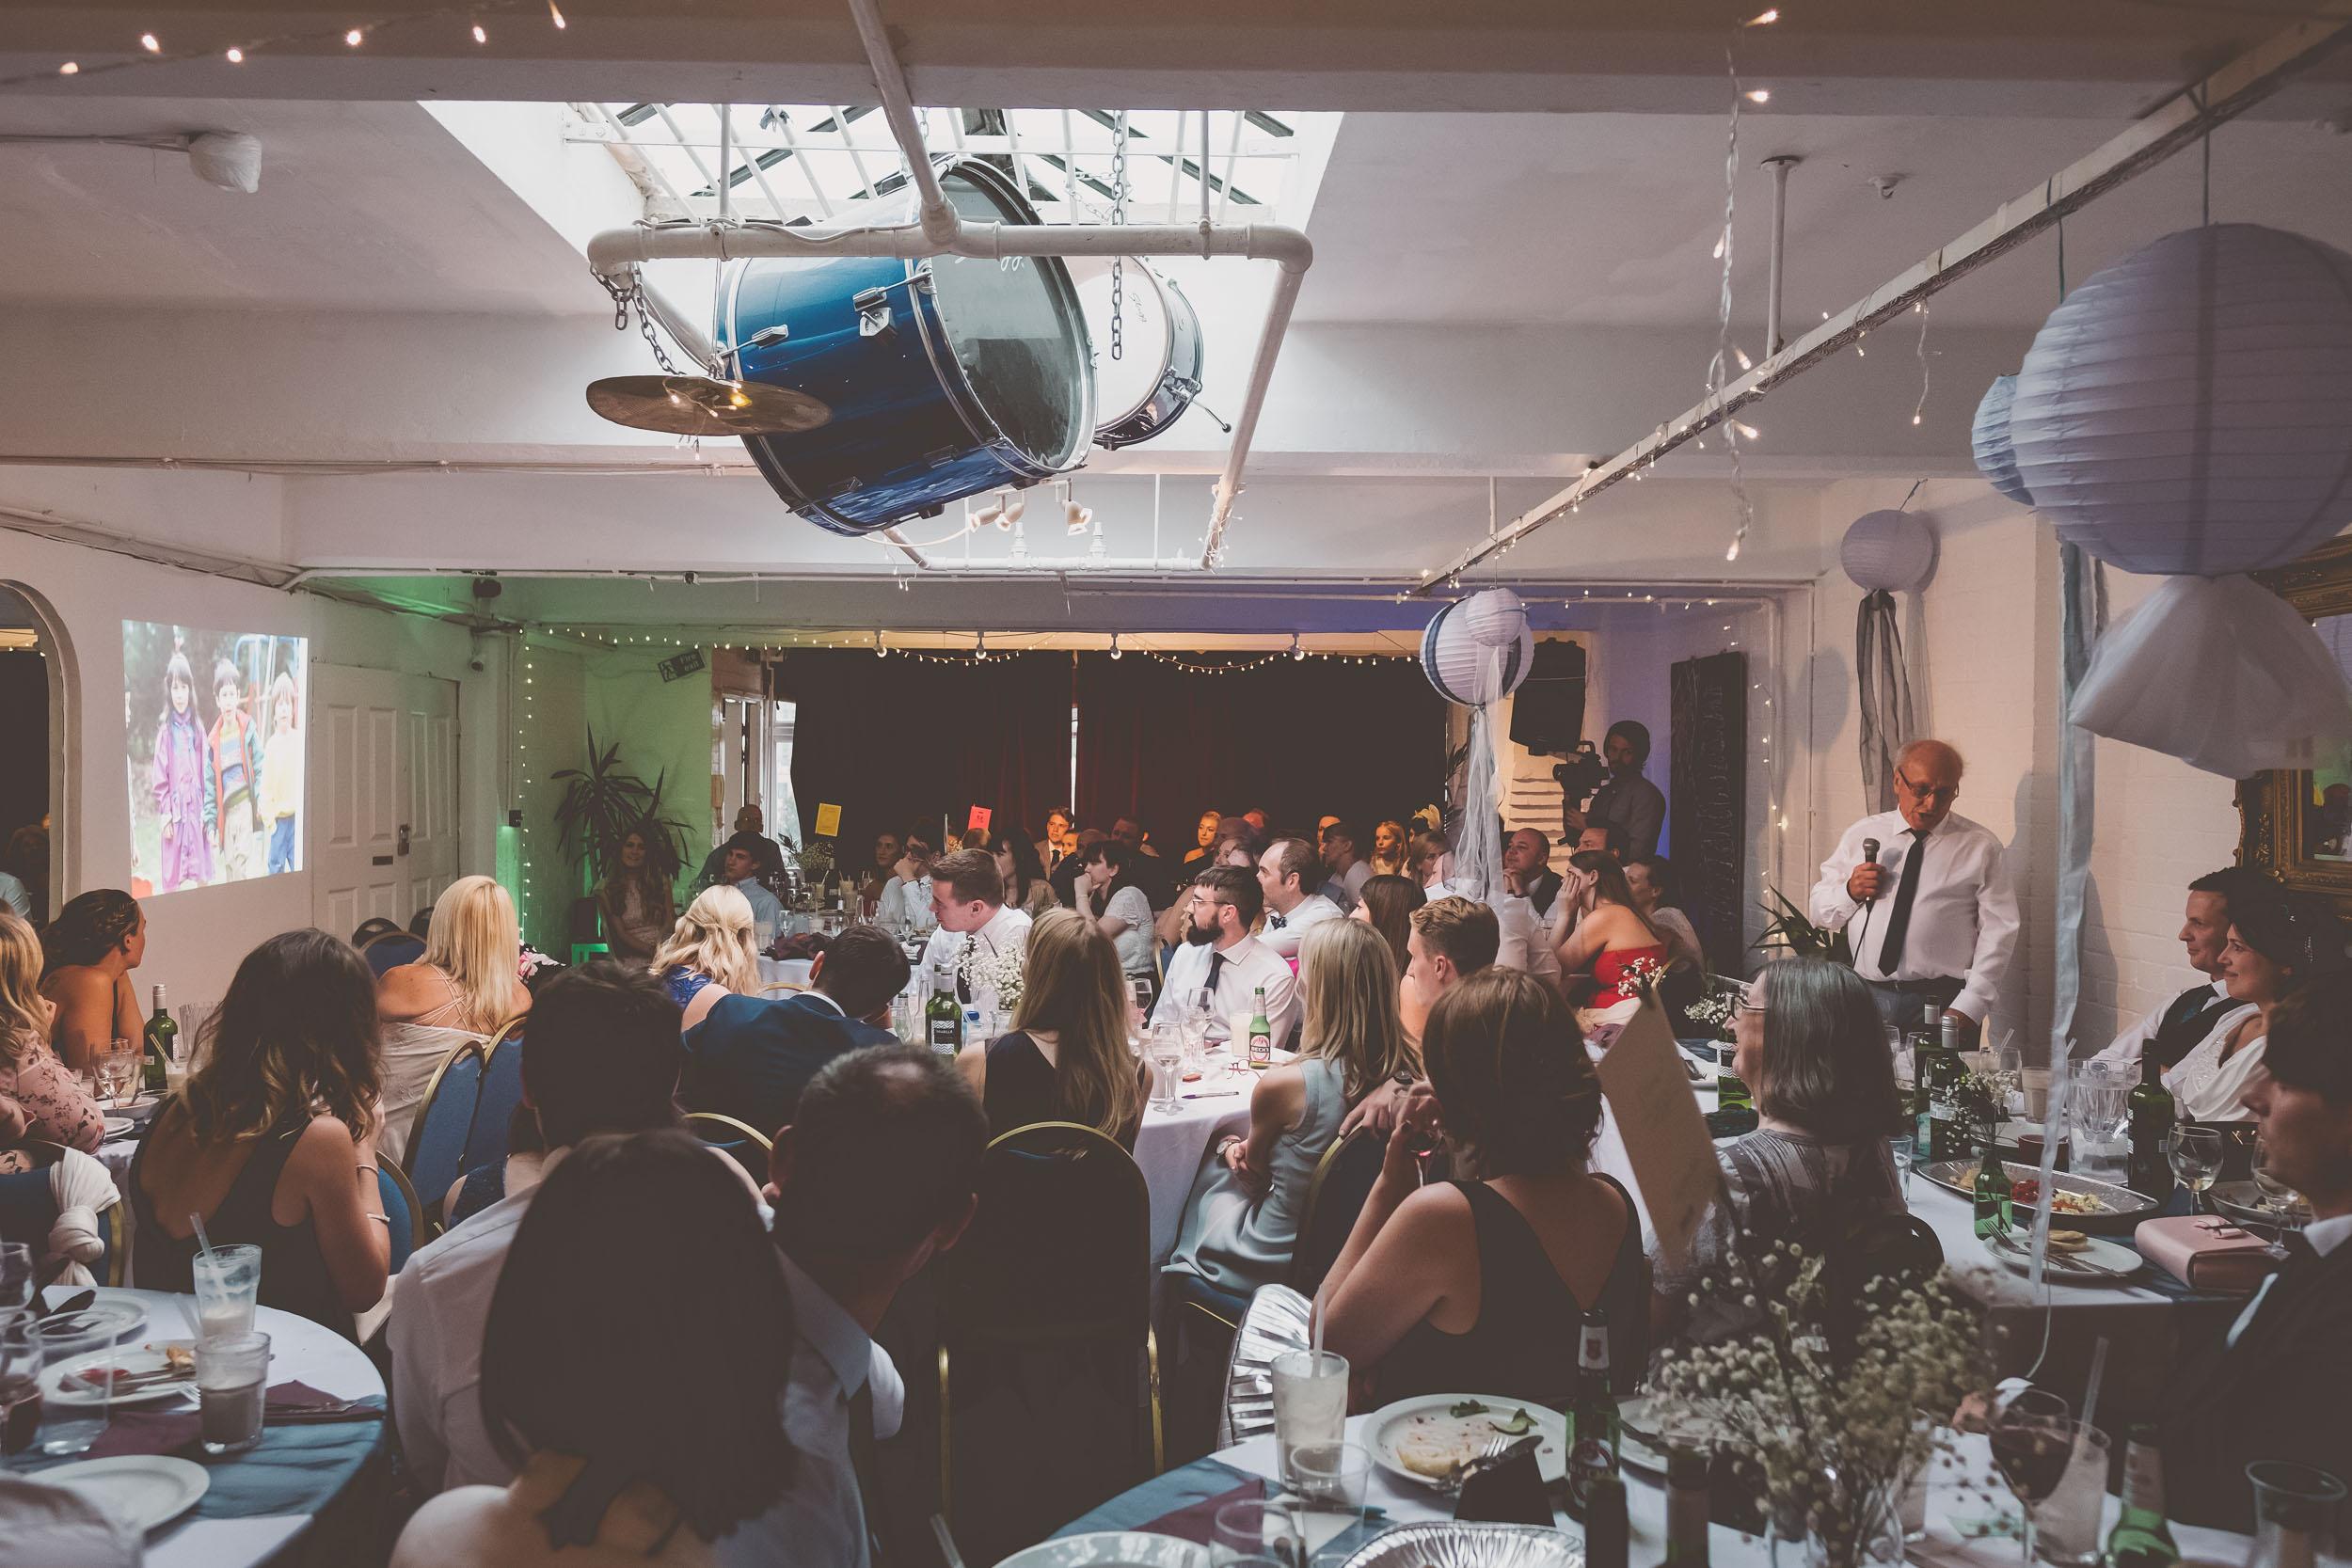 islington-town-hall-4th-floor-studios-wedding358.jpg